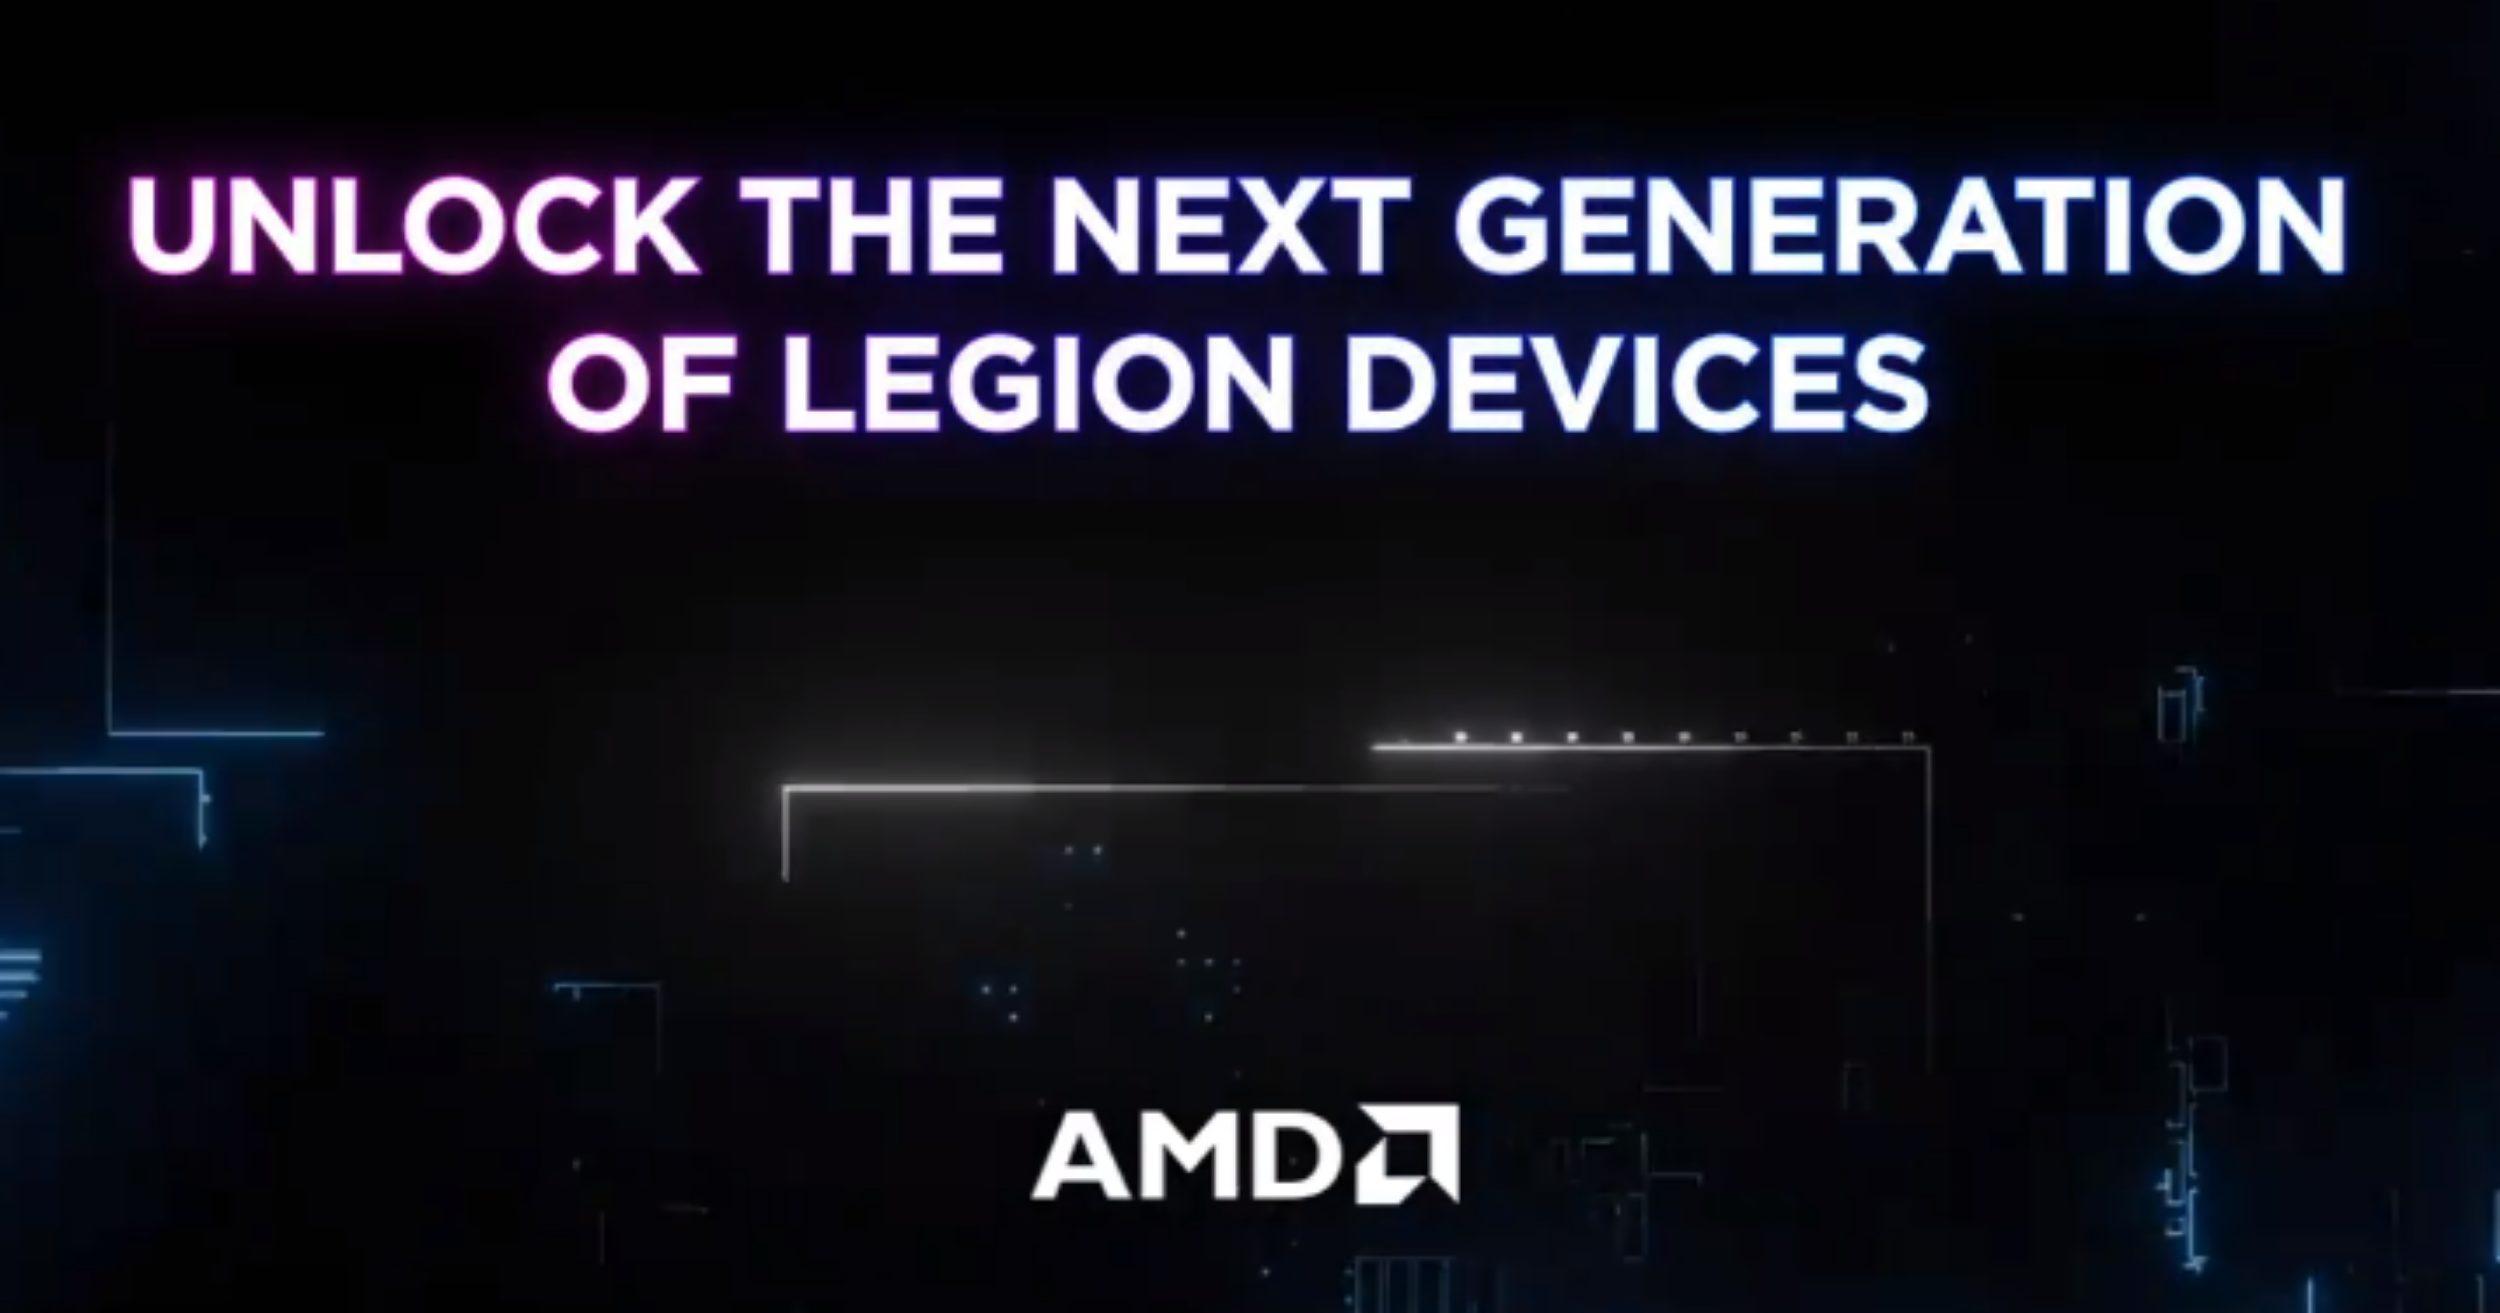 lenovo-to-announce-next-gen-legion-devices-with-amd-ryzen-5000-h-series